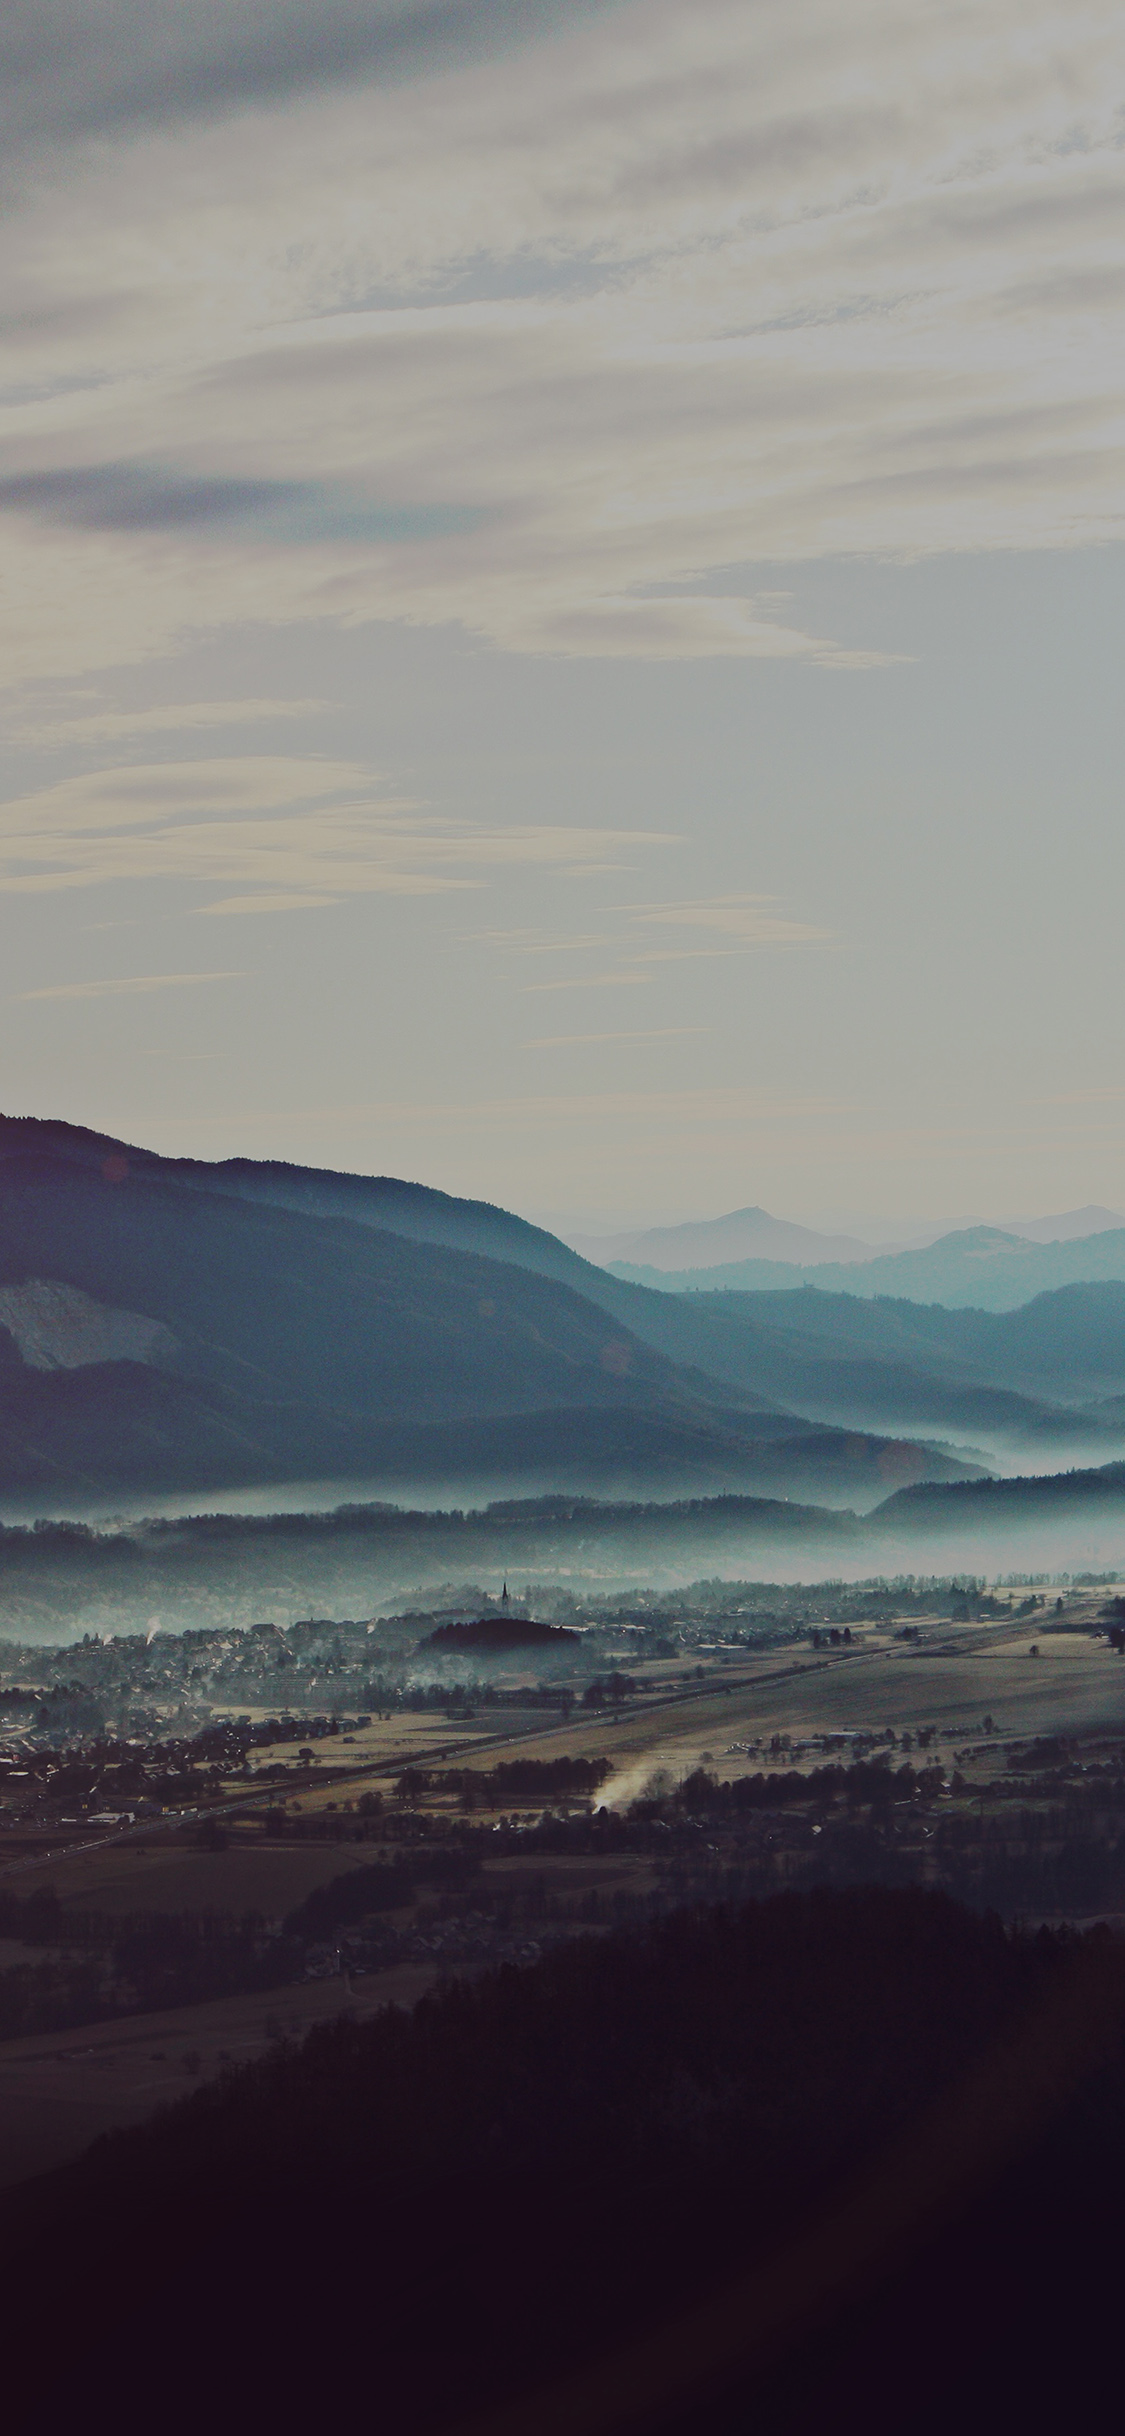 Iphonexpapers Com Iphone X Wallpaper Nc14 Landscape Mountain